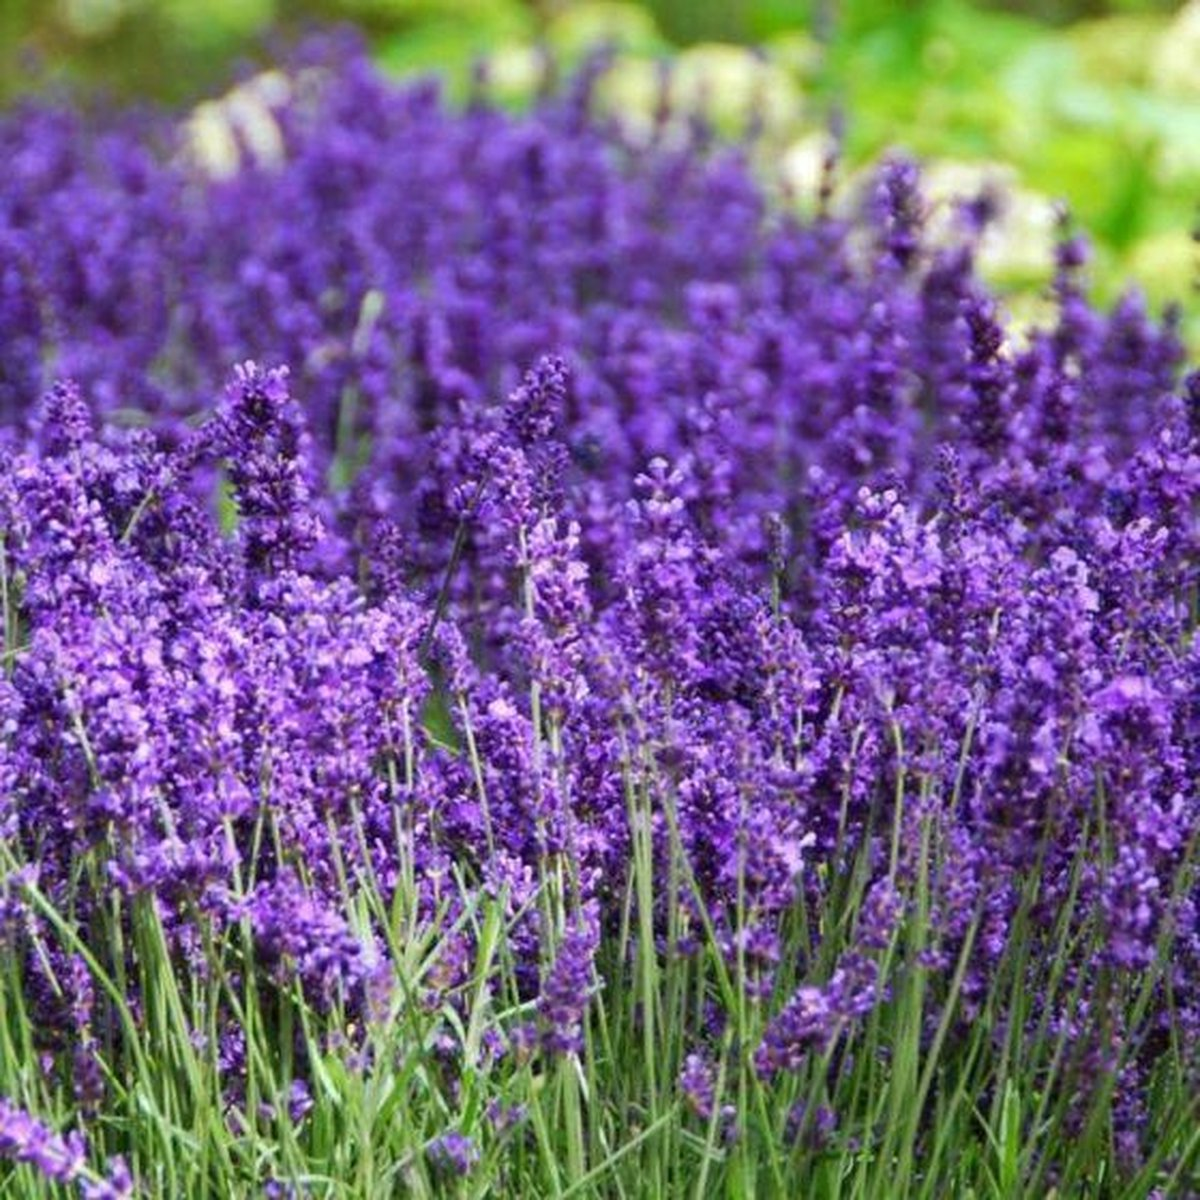 12 x  Lavandula Hidcote - Lavendel in 9x9cm pot (stukprijs € 2,67)